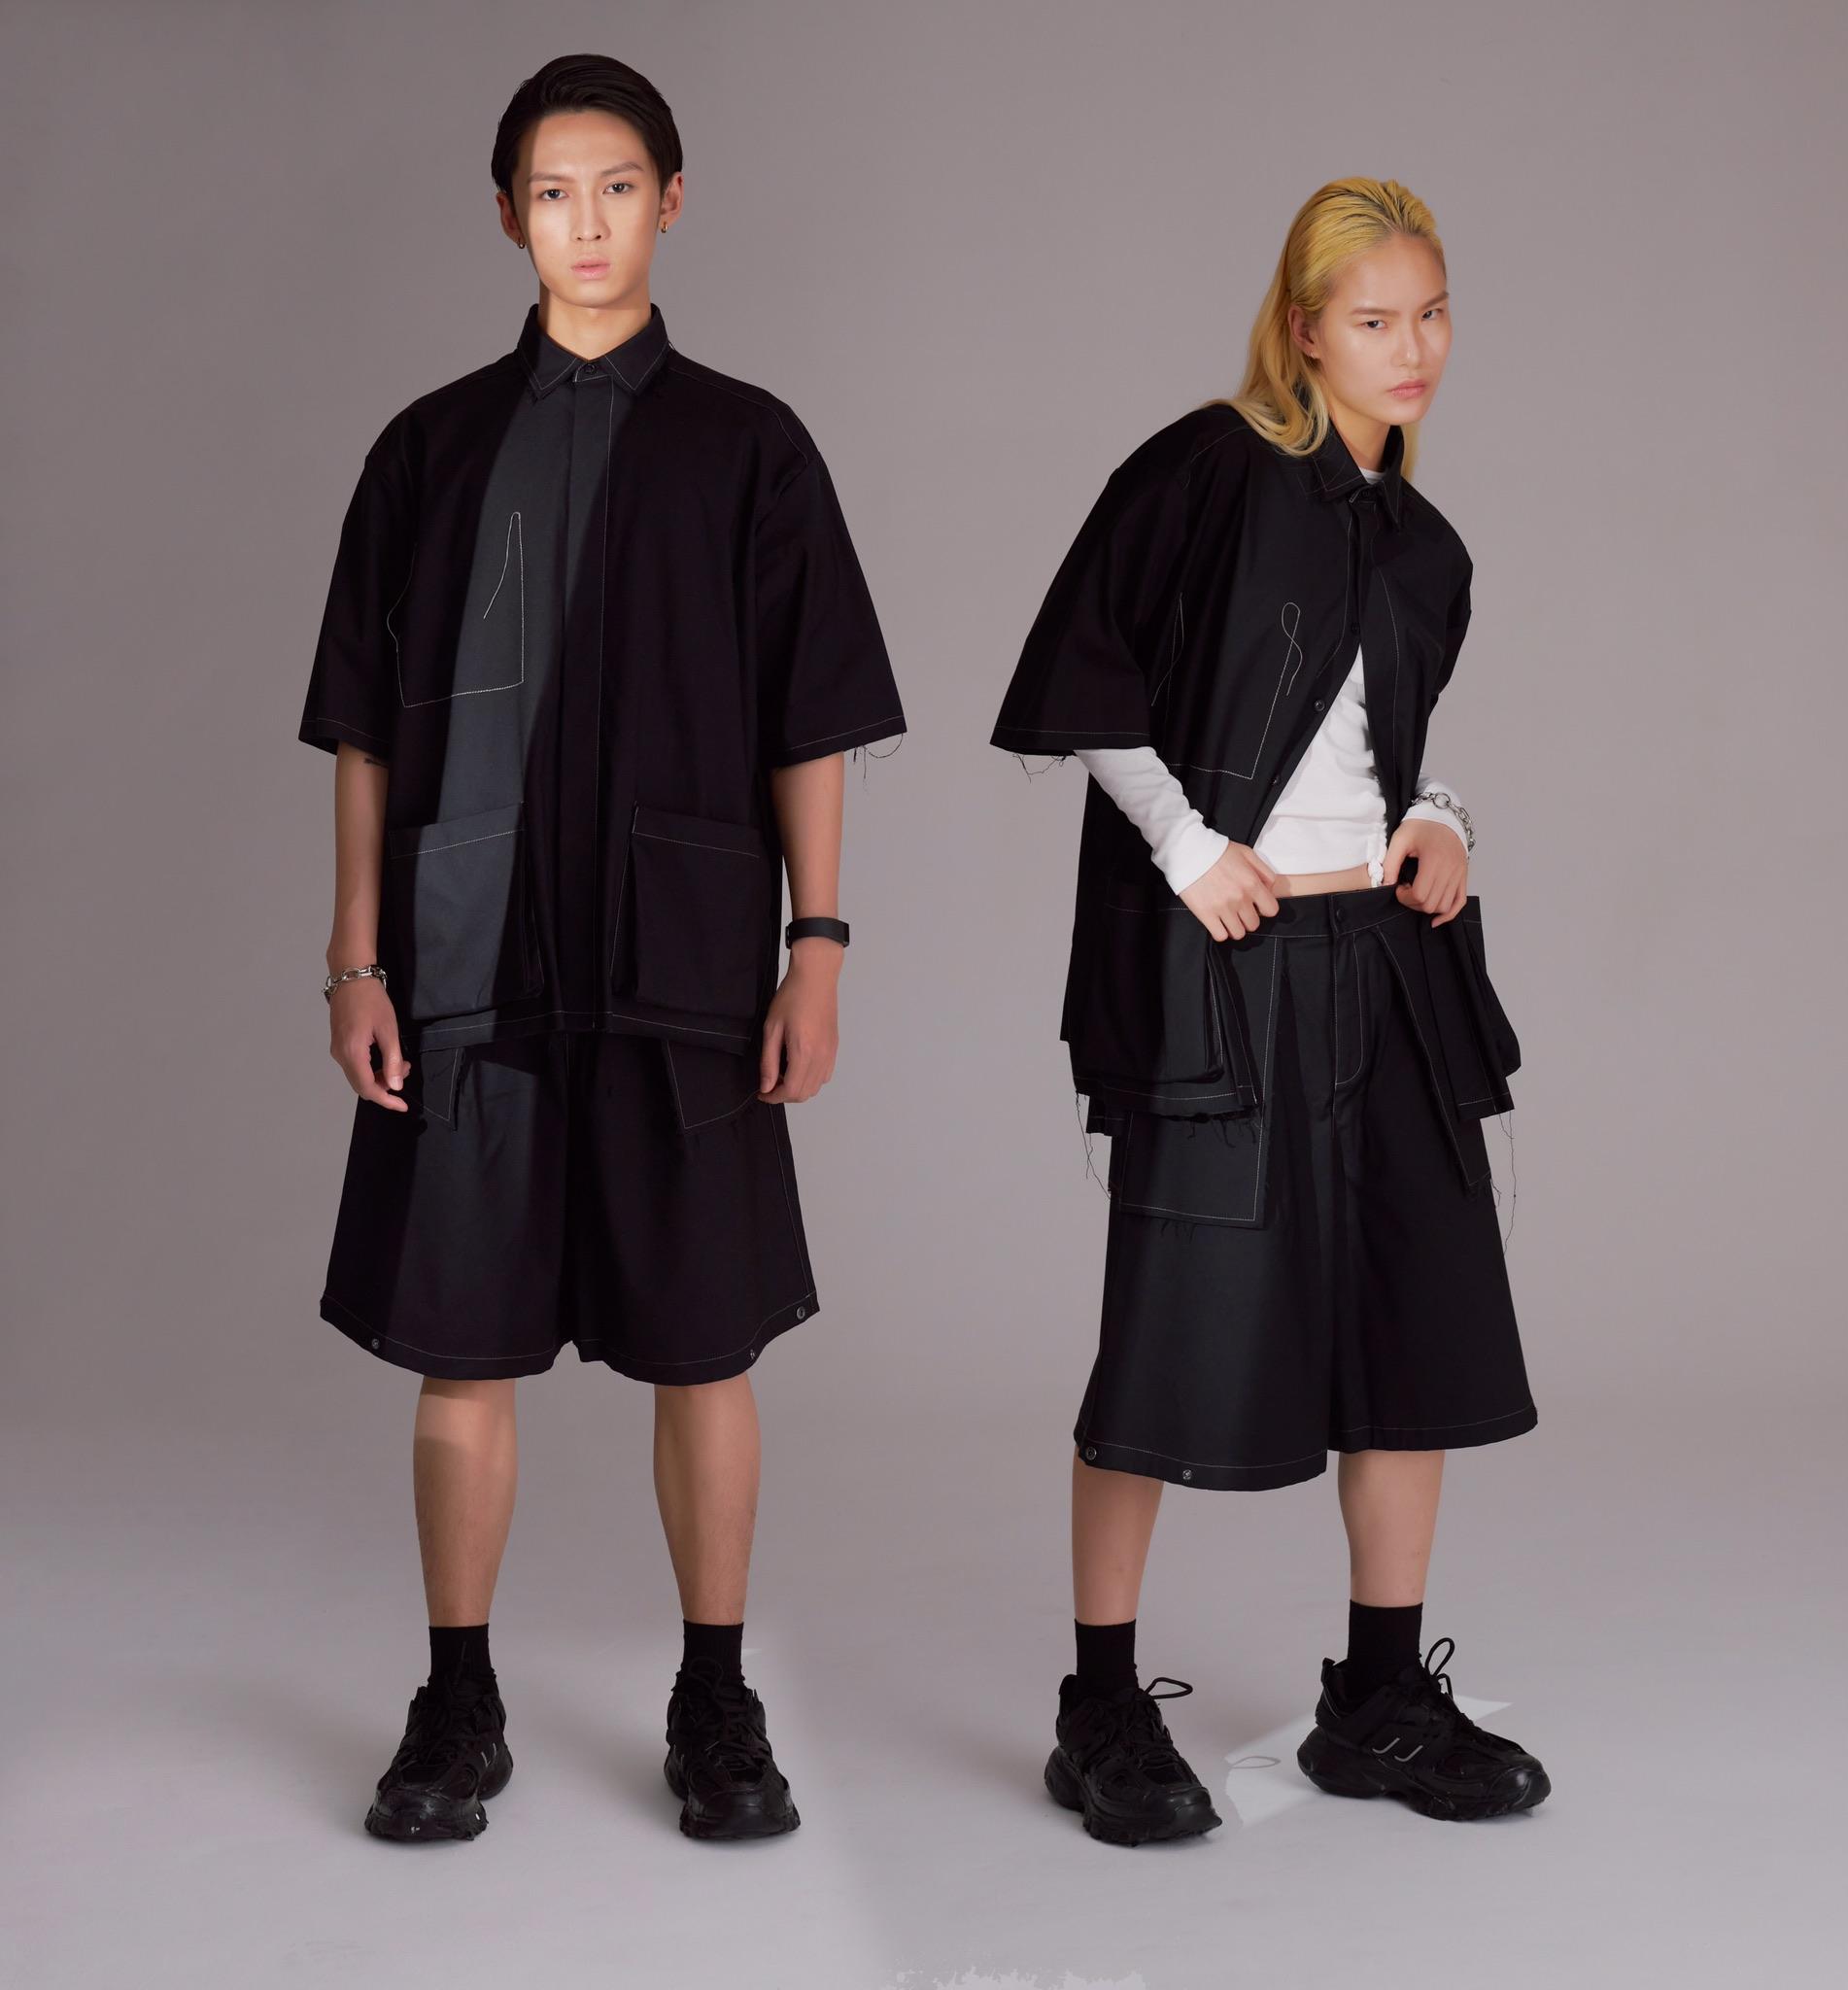 common comma macau fashion brand models Source Brand